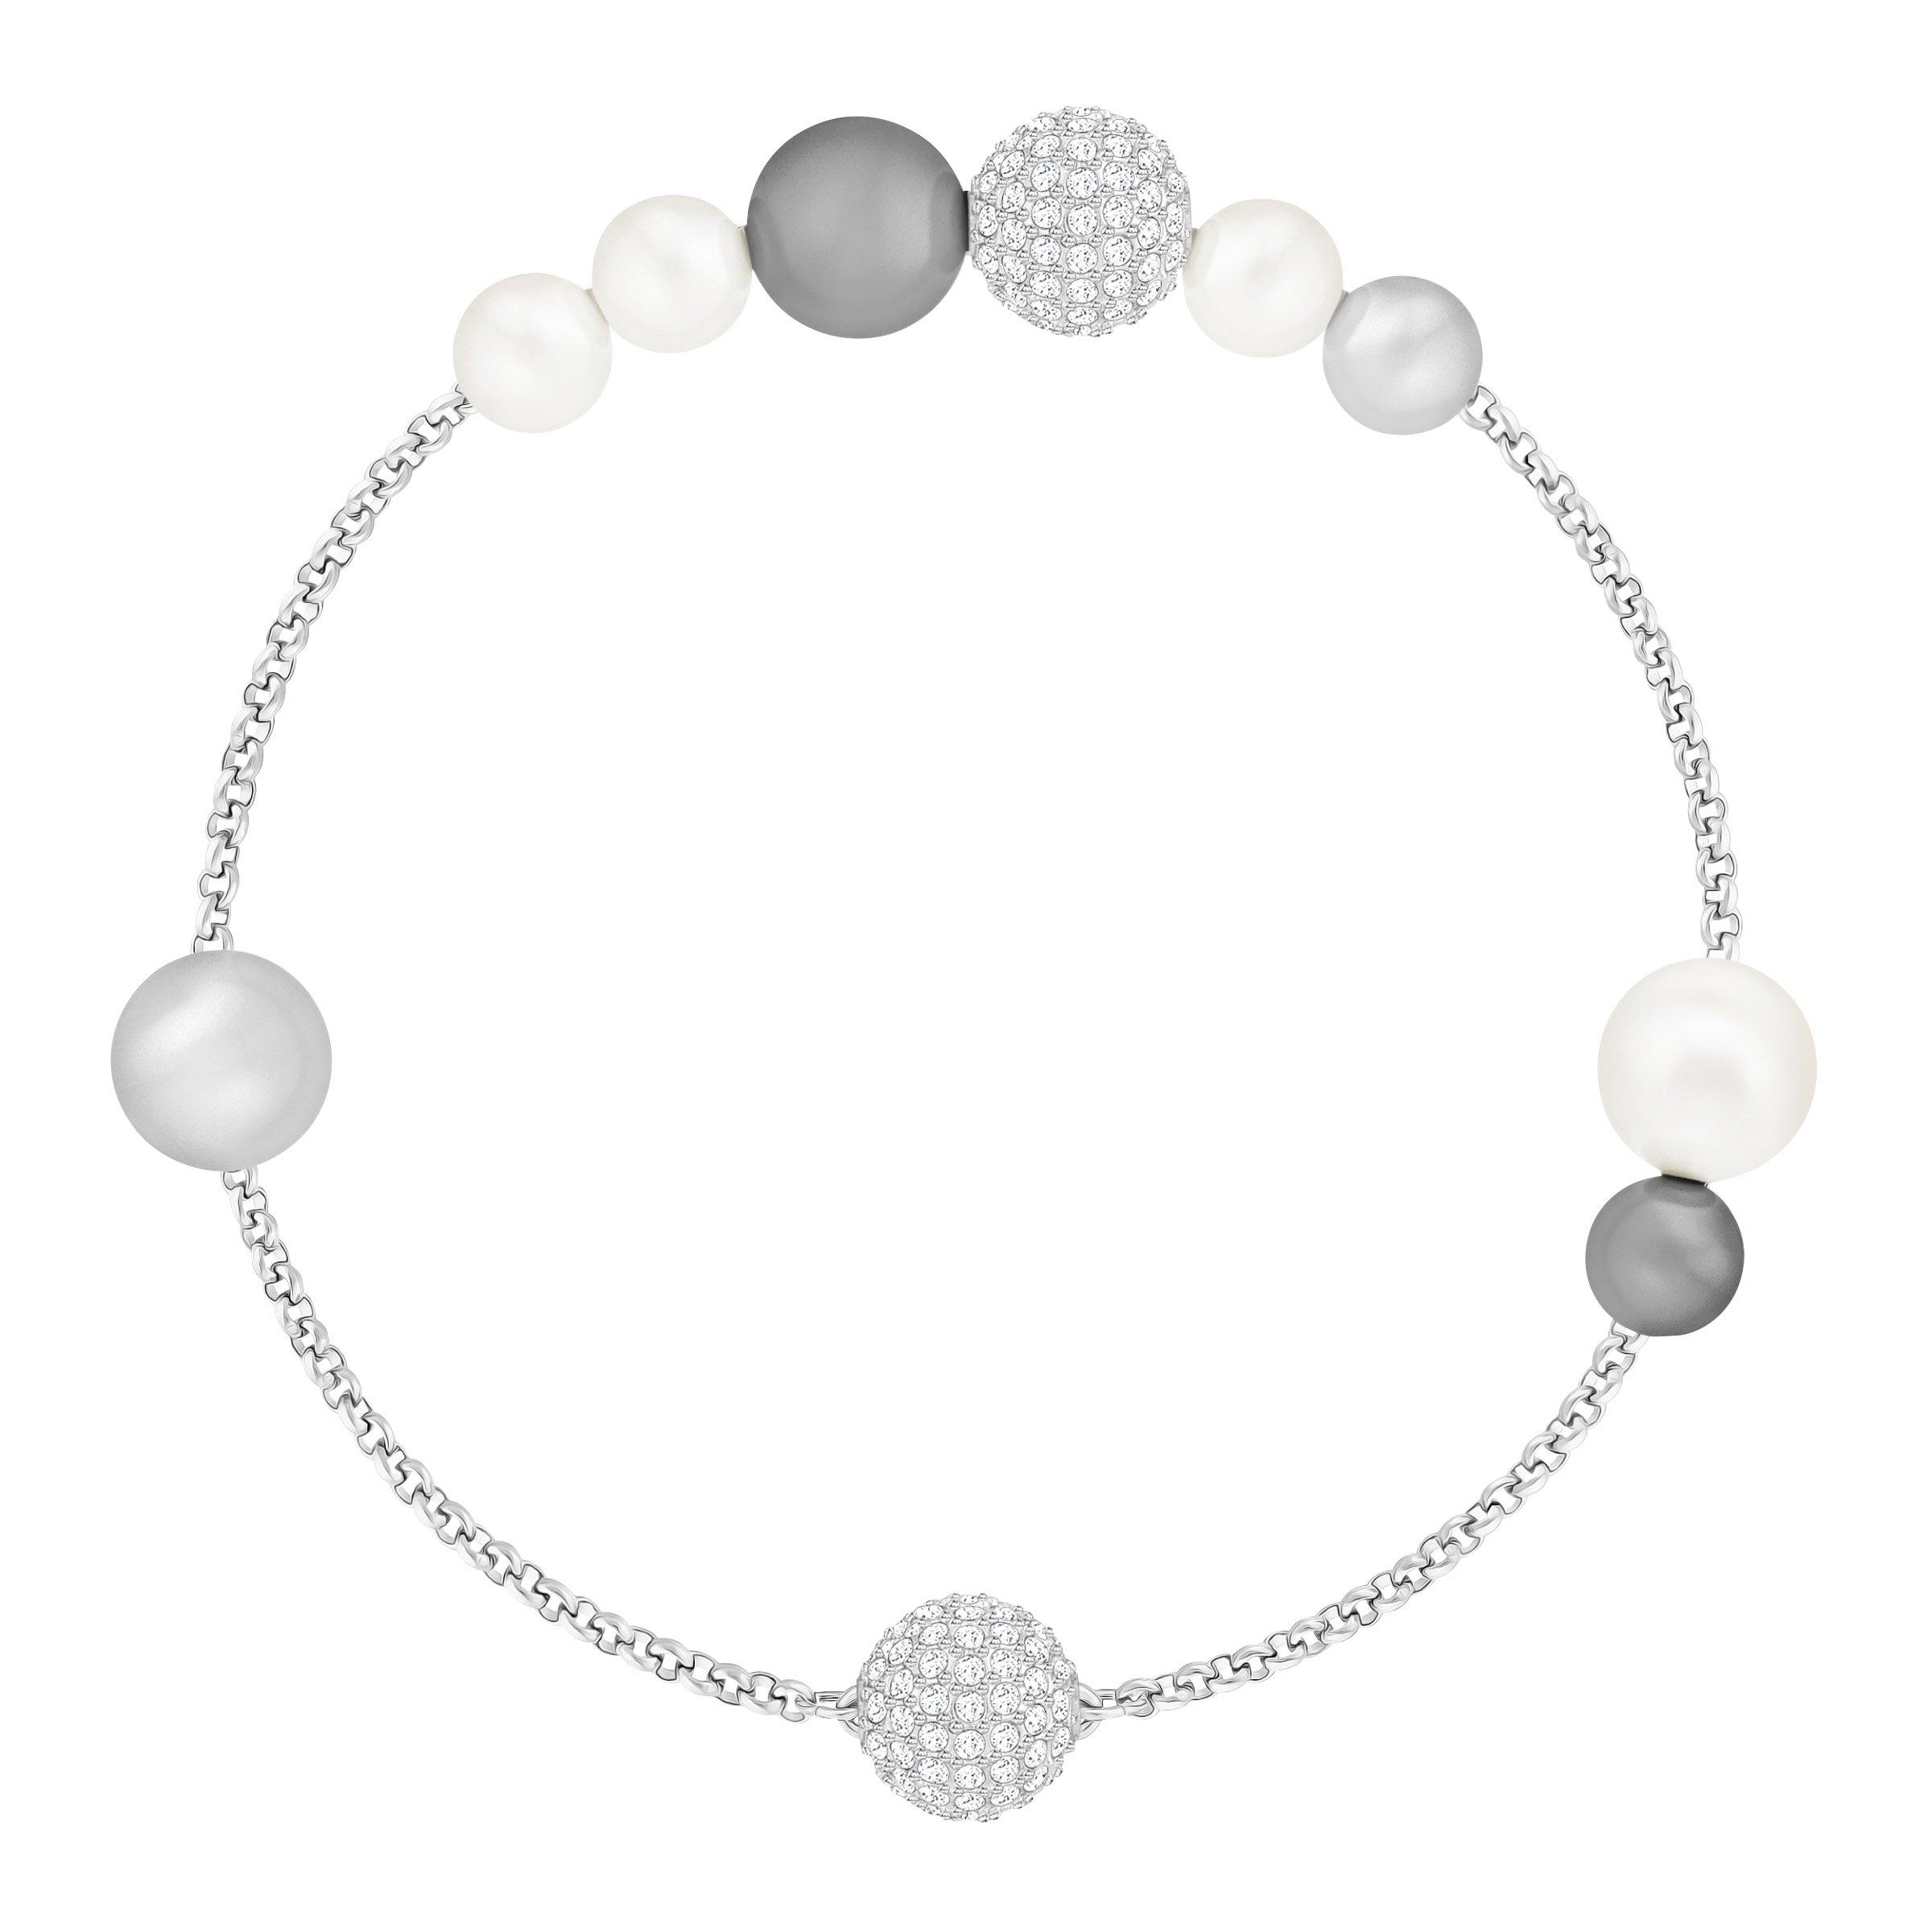 Remix Forever Strand Bracelet with Sparkling White Crystals